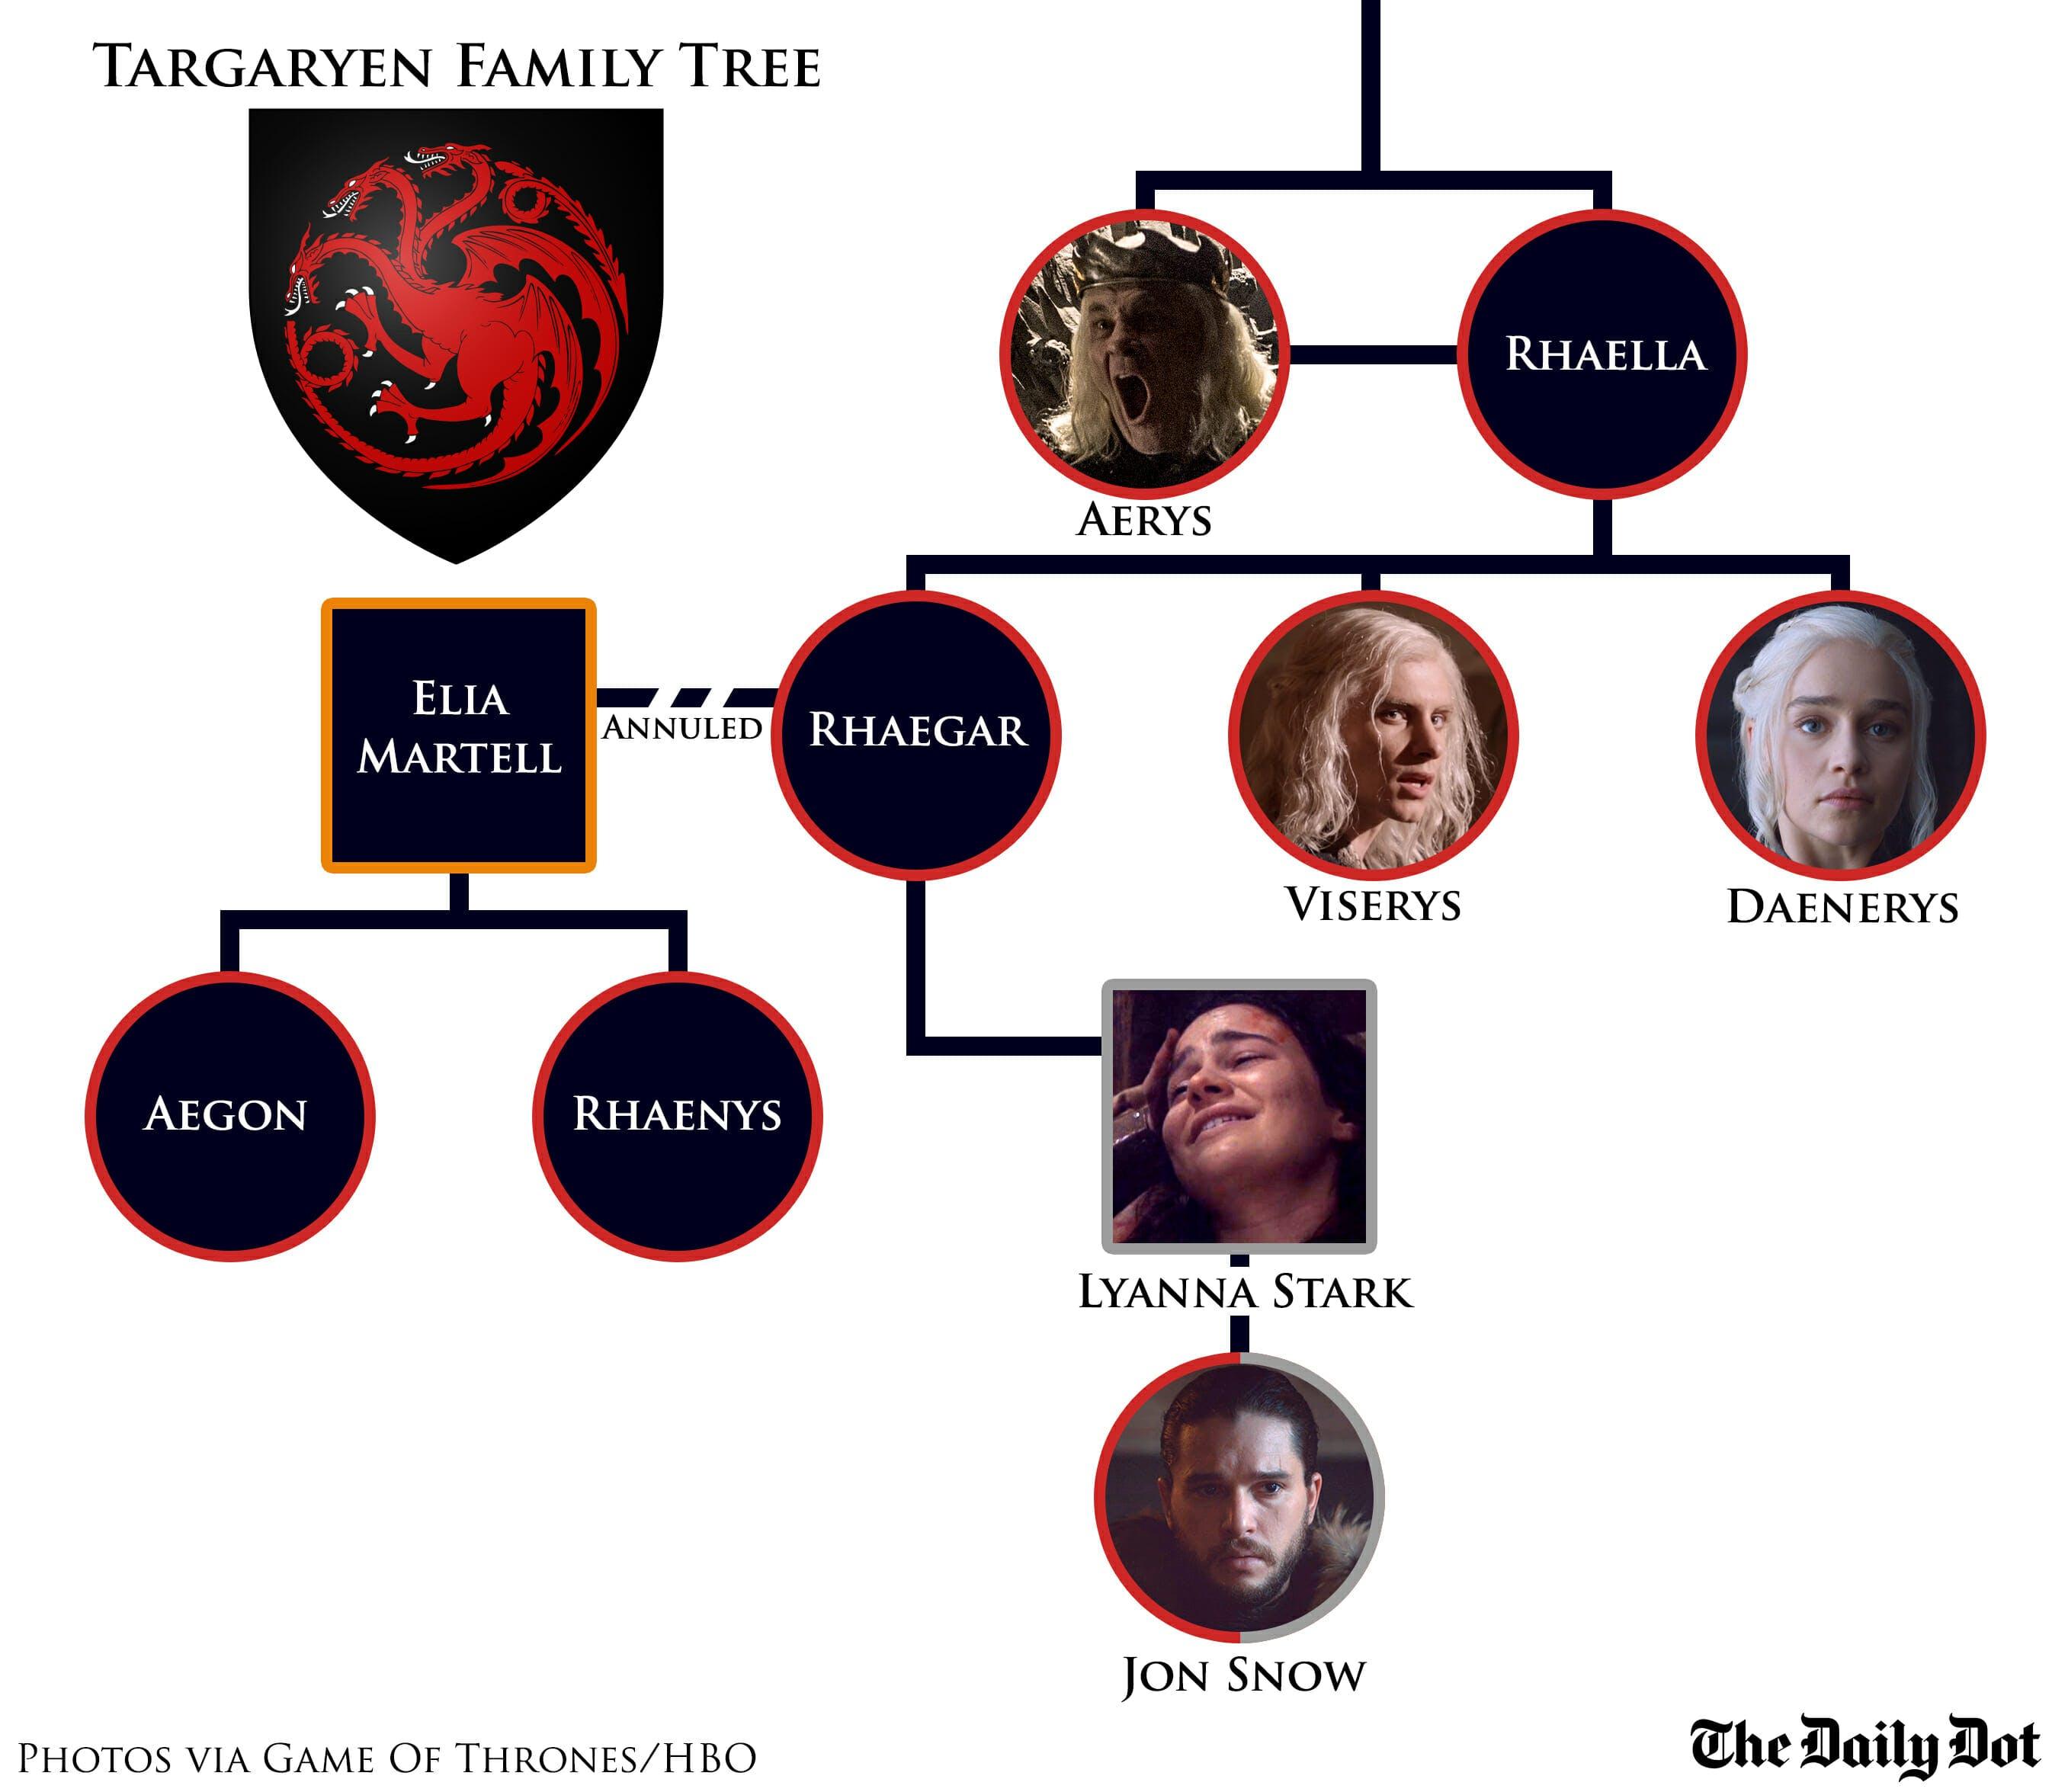 Targaryen family tree from Aerys to Jon Snow